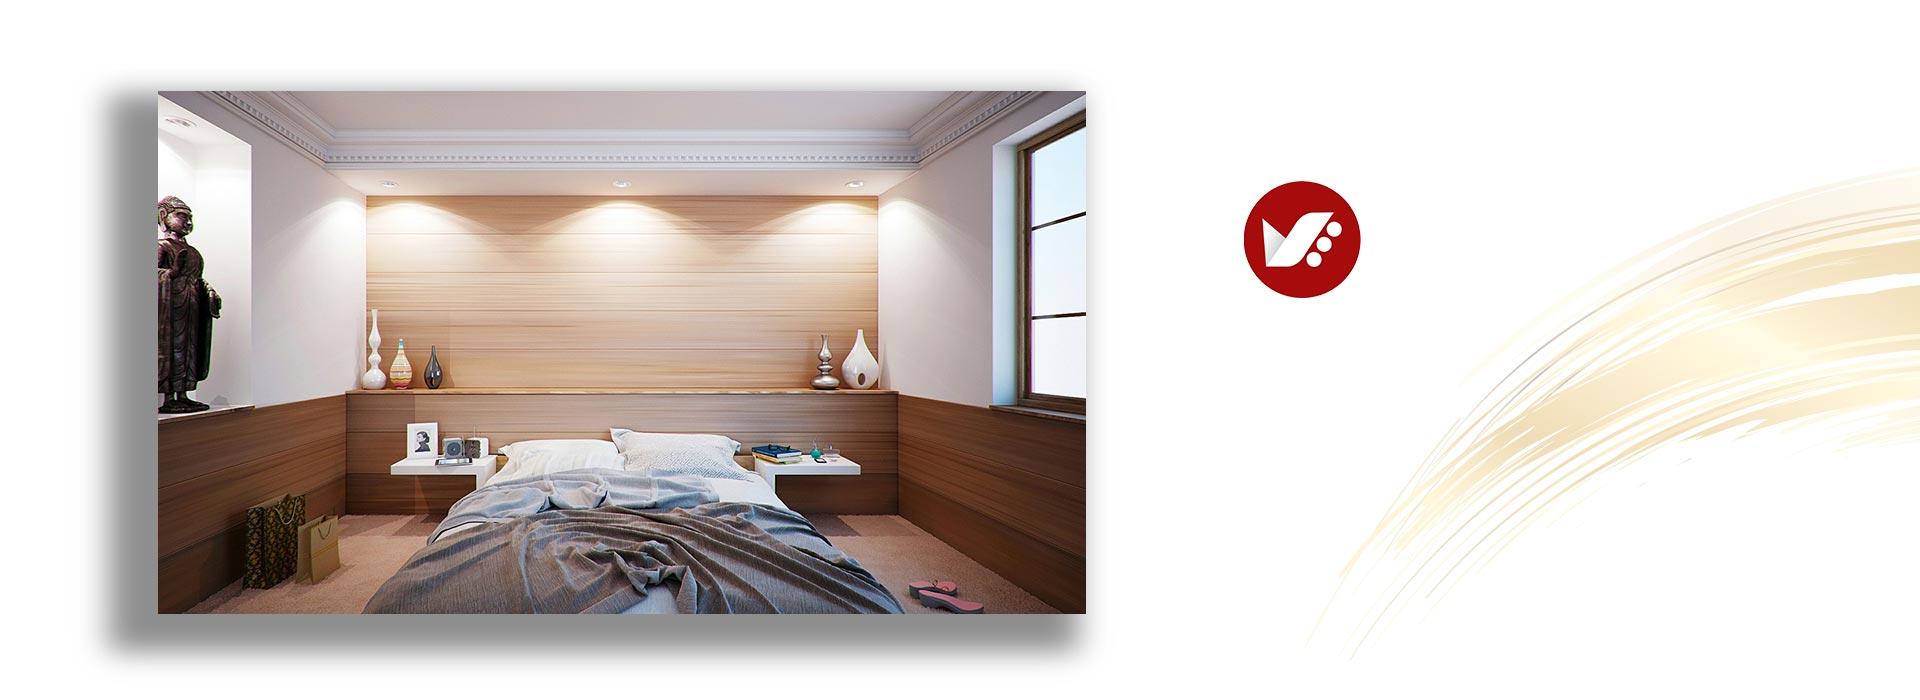 bedroom makeover ideas - تغییر دکوراسیون اتاق خواب